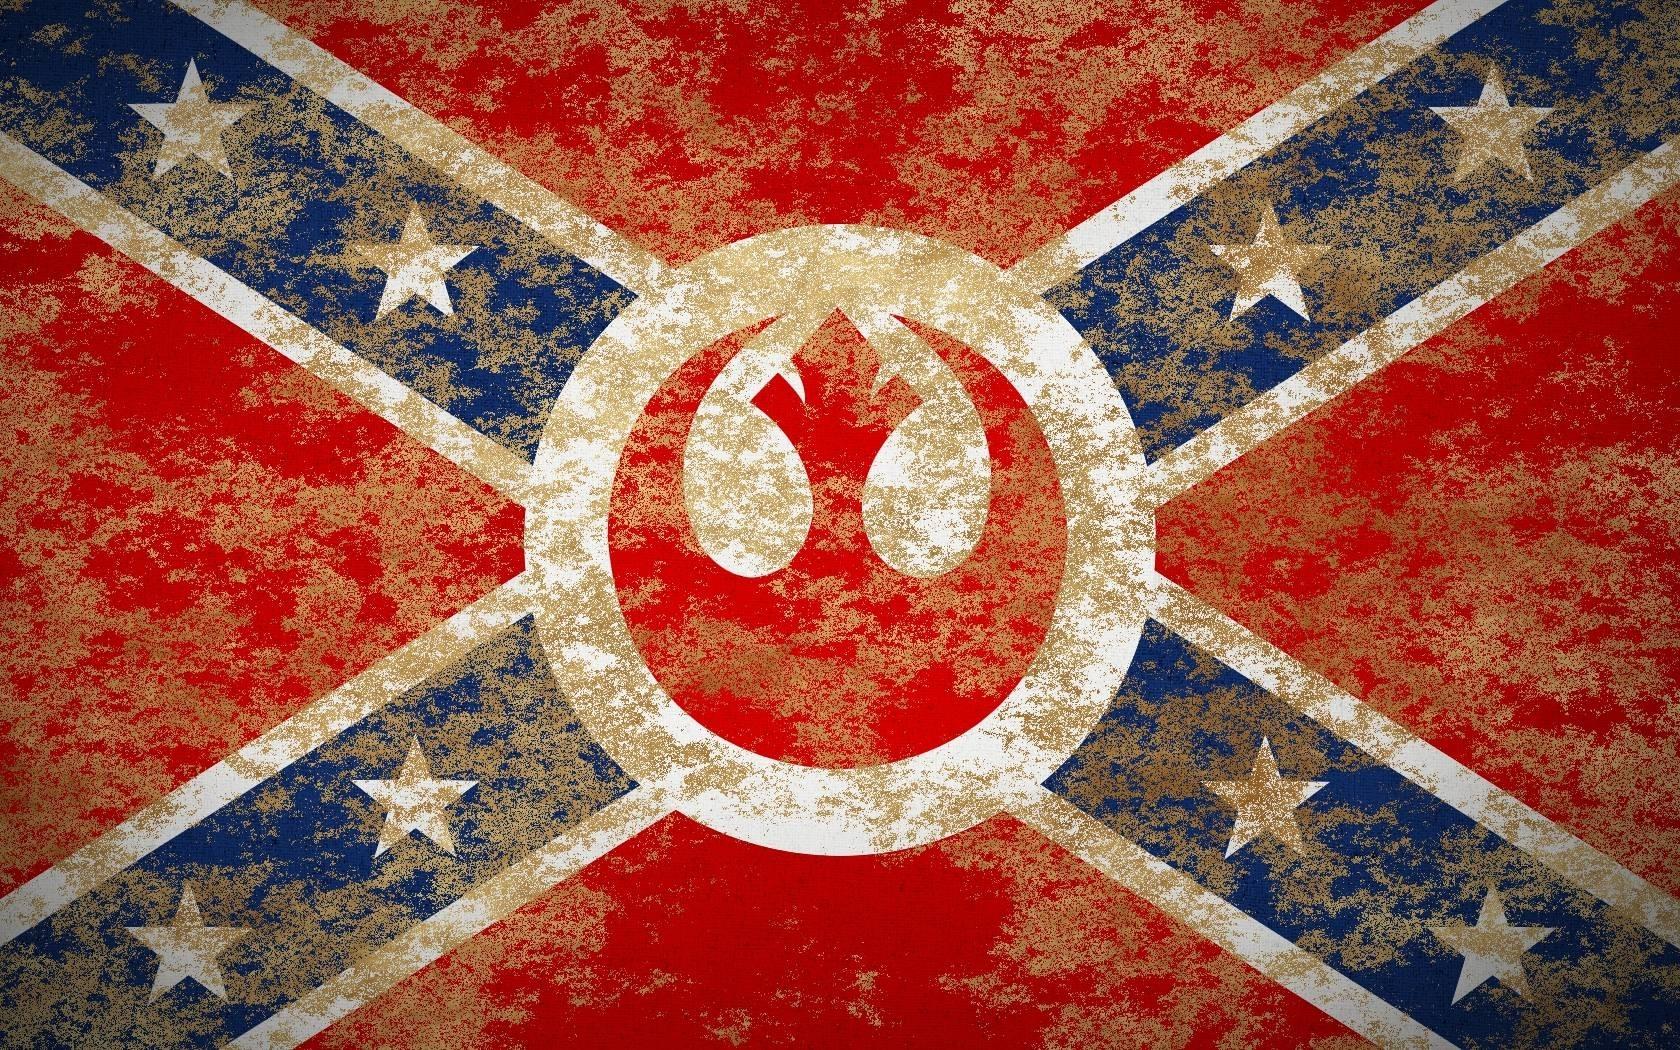 Confederate Flag Wallpaper For Iphone 6 Labzada